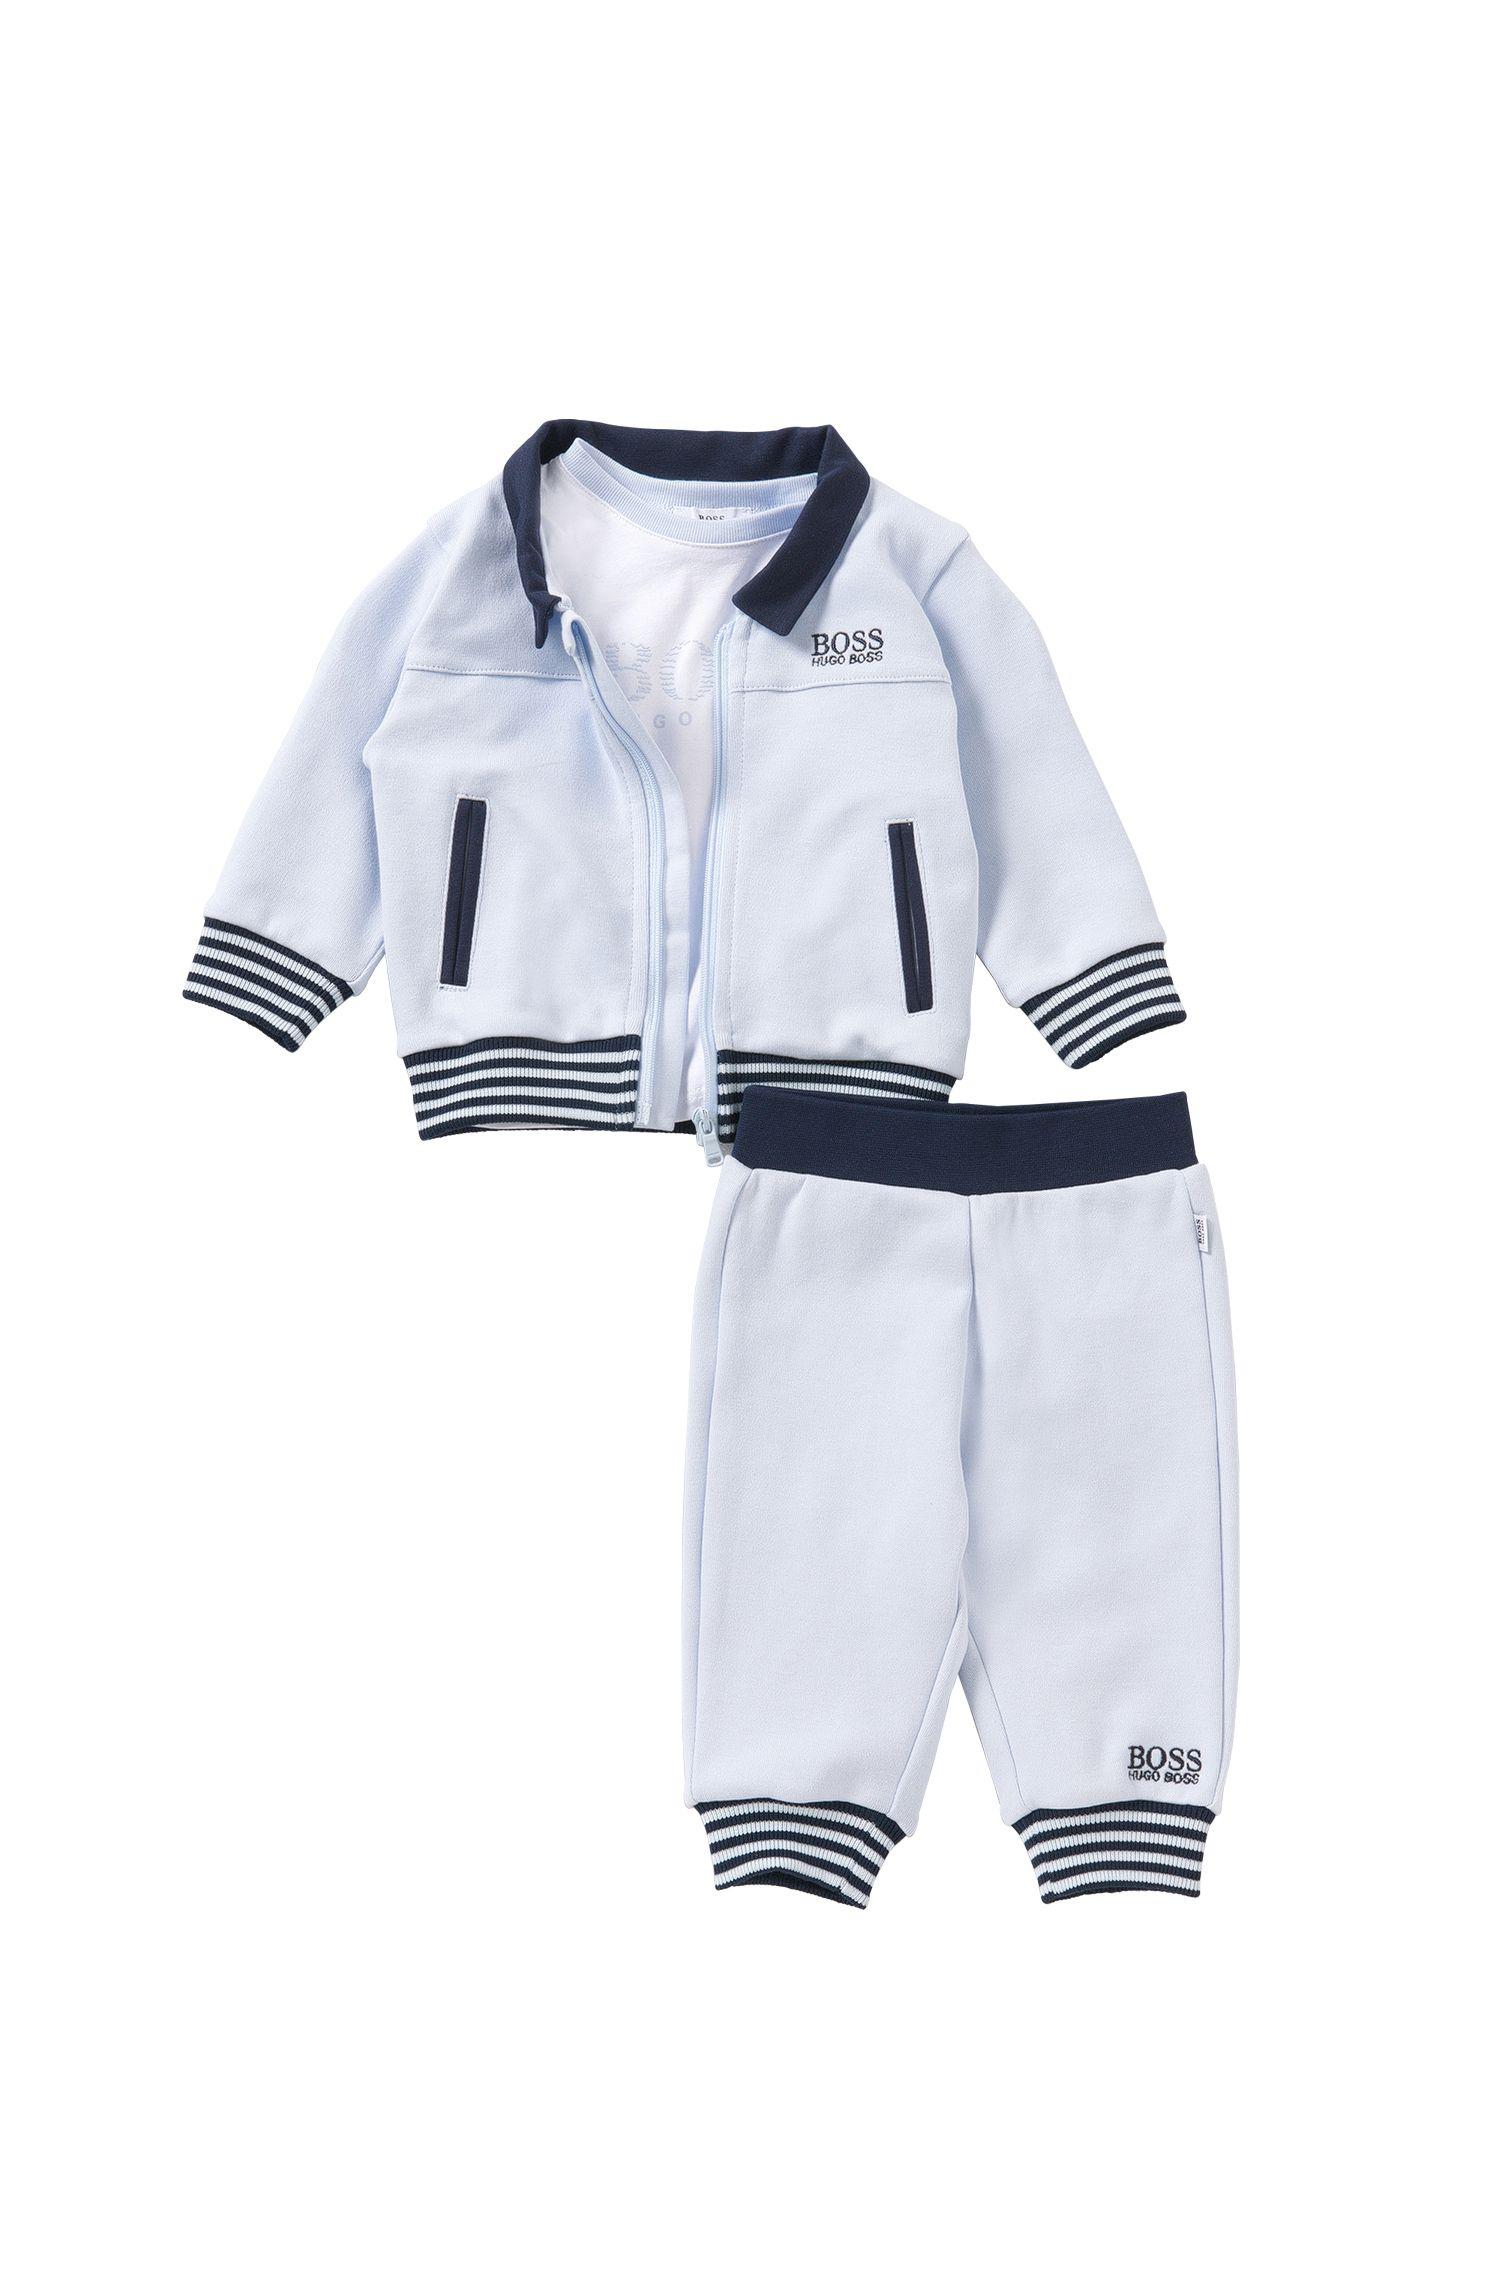 Newborn set consisting of a sweatshirt jacket, t-shirt and trousers: 'J98149'